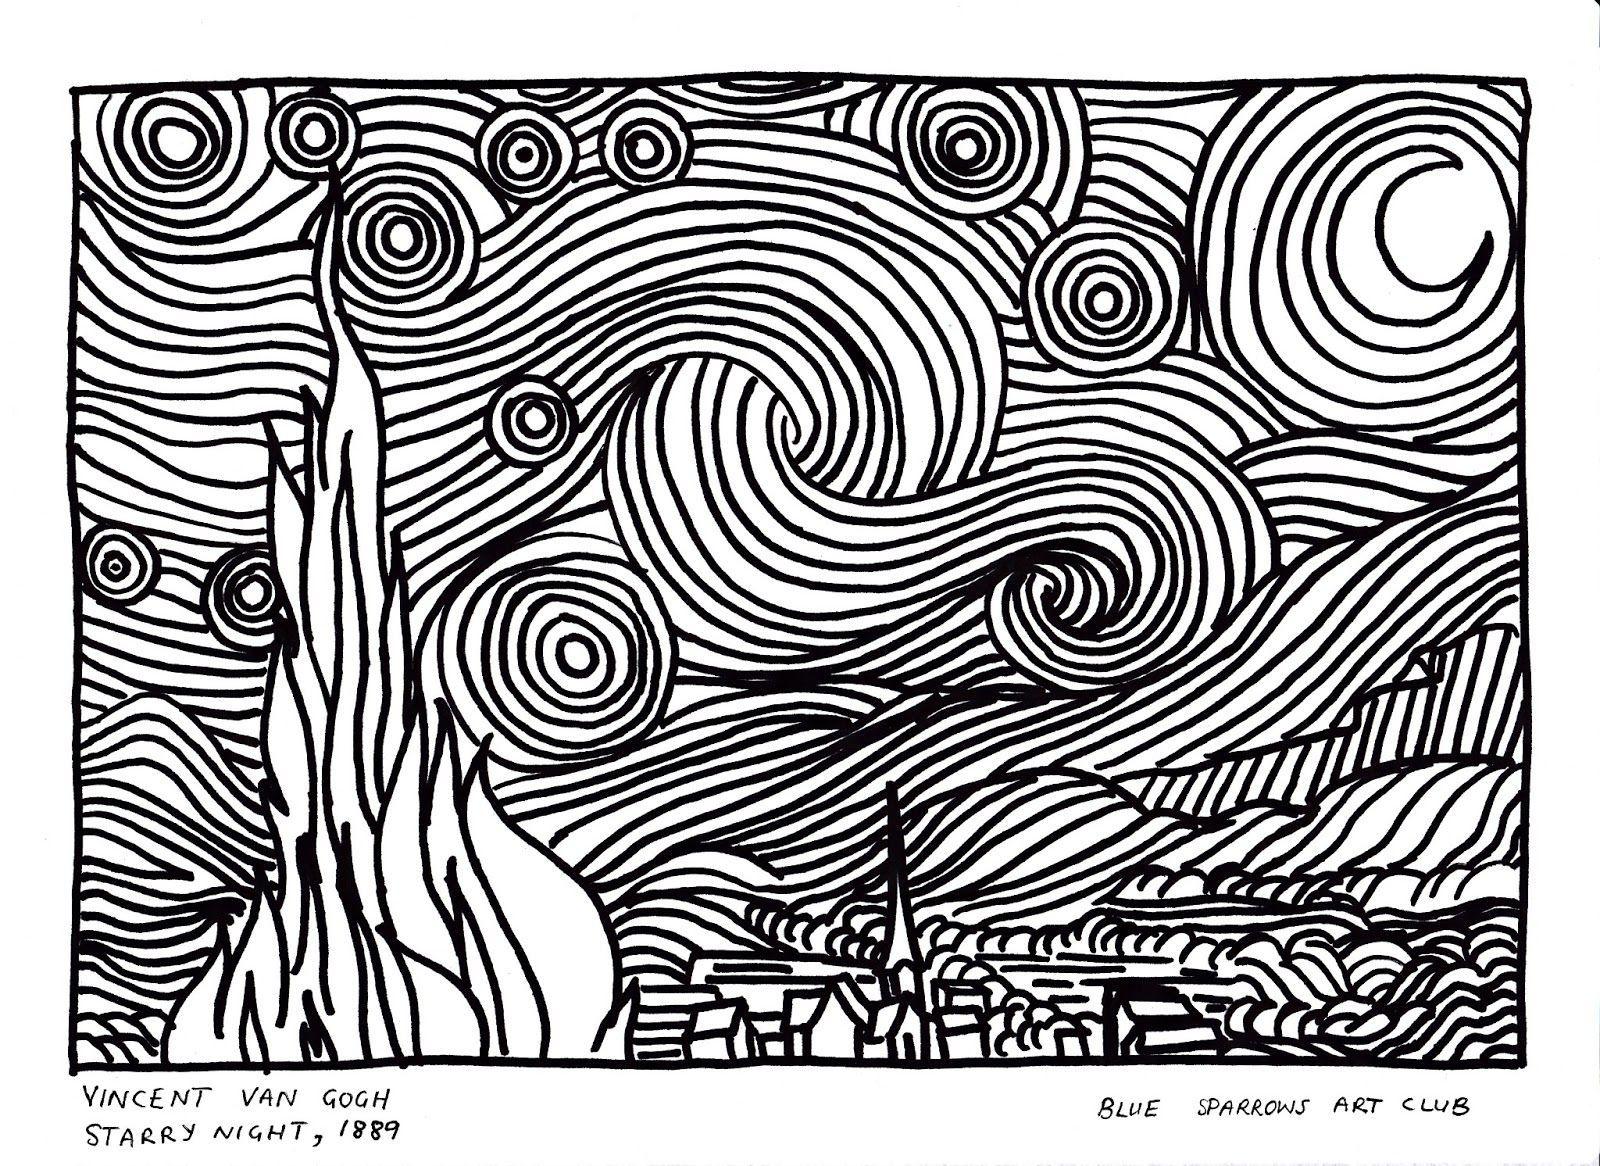 Resultado De Imagen Para Croquis Starring Night Vincent Van Gogh Notte Stellata Ricamo Disegni A Matita